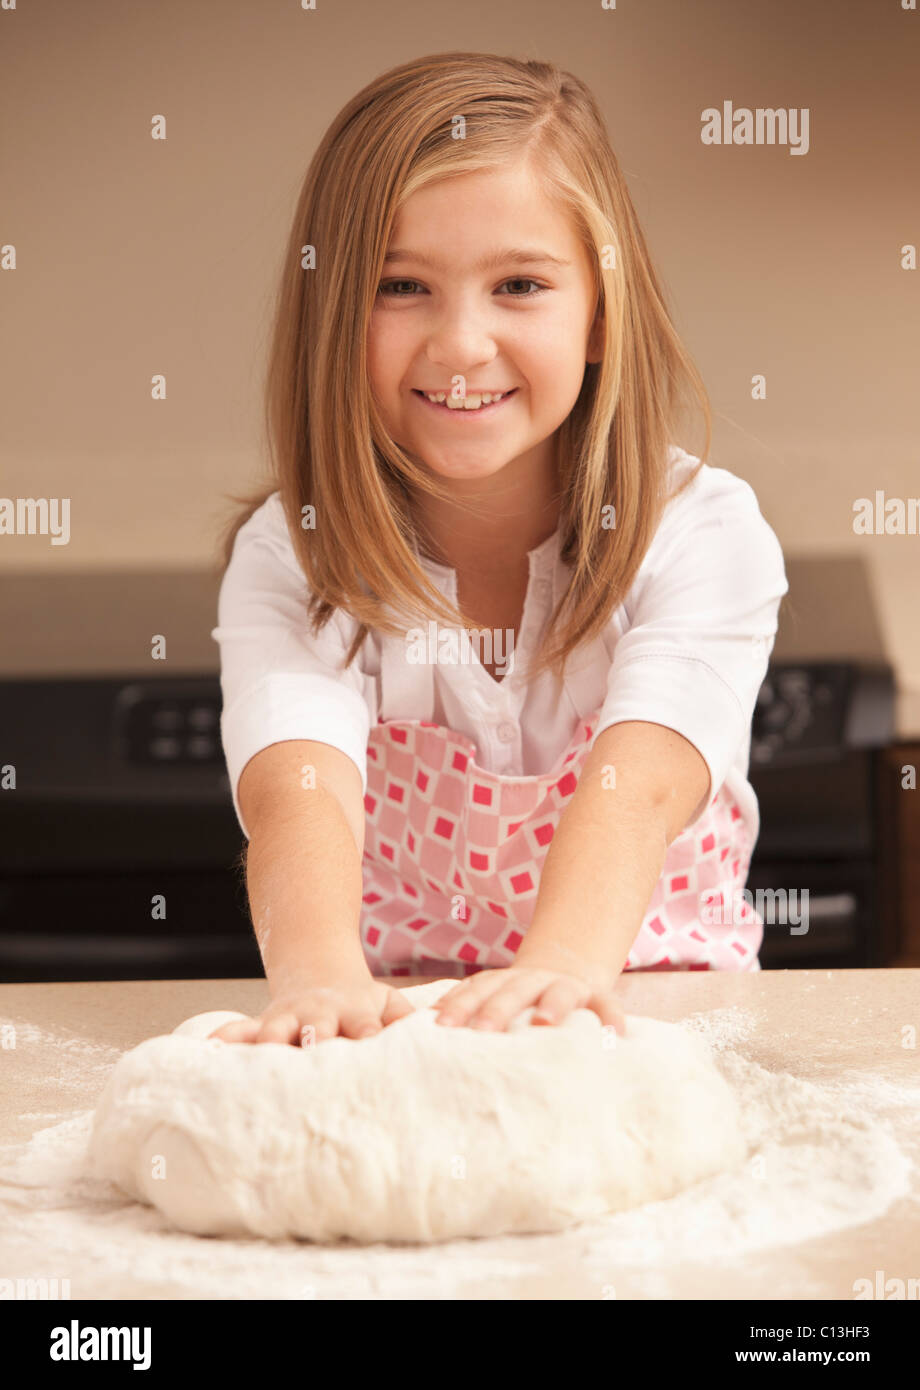 USA, Utah, Lehi, Portrait of girl (10-11) kneading dough in kitchen - Stock Image